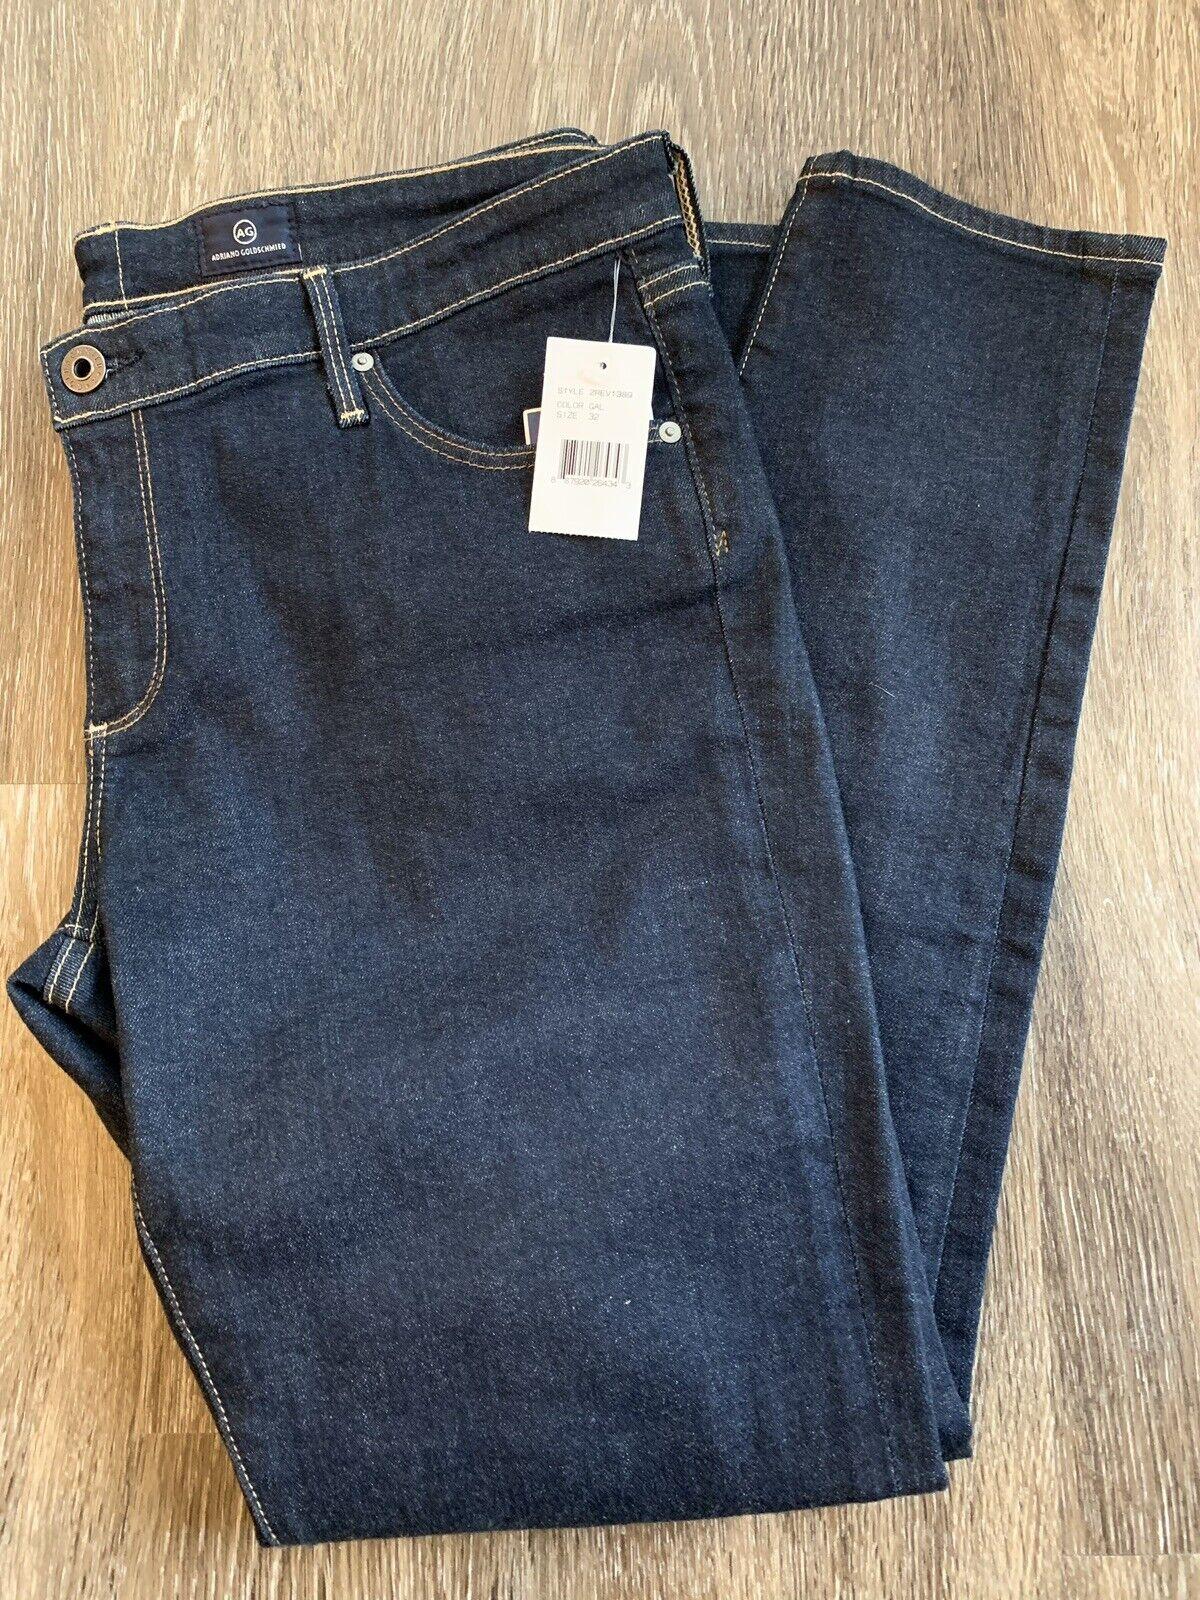 NWT AG Denim The Legging Ankle Super Skinny Jeans Womens Size 32